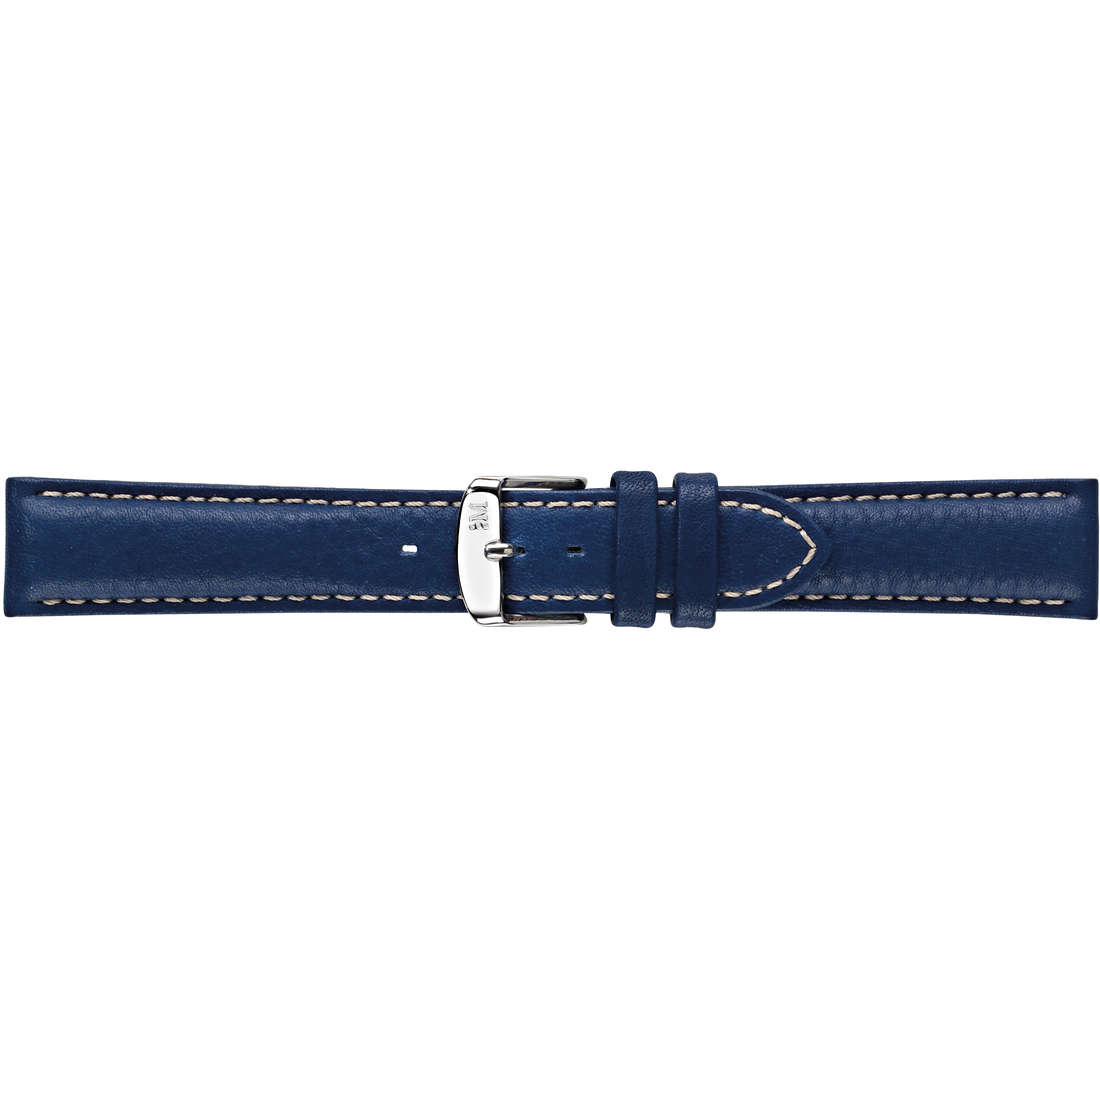 watch watch bands watch straps man Morellato Linea Sport A01U3821712062CR22